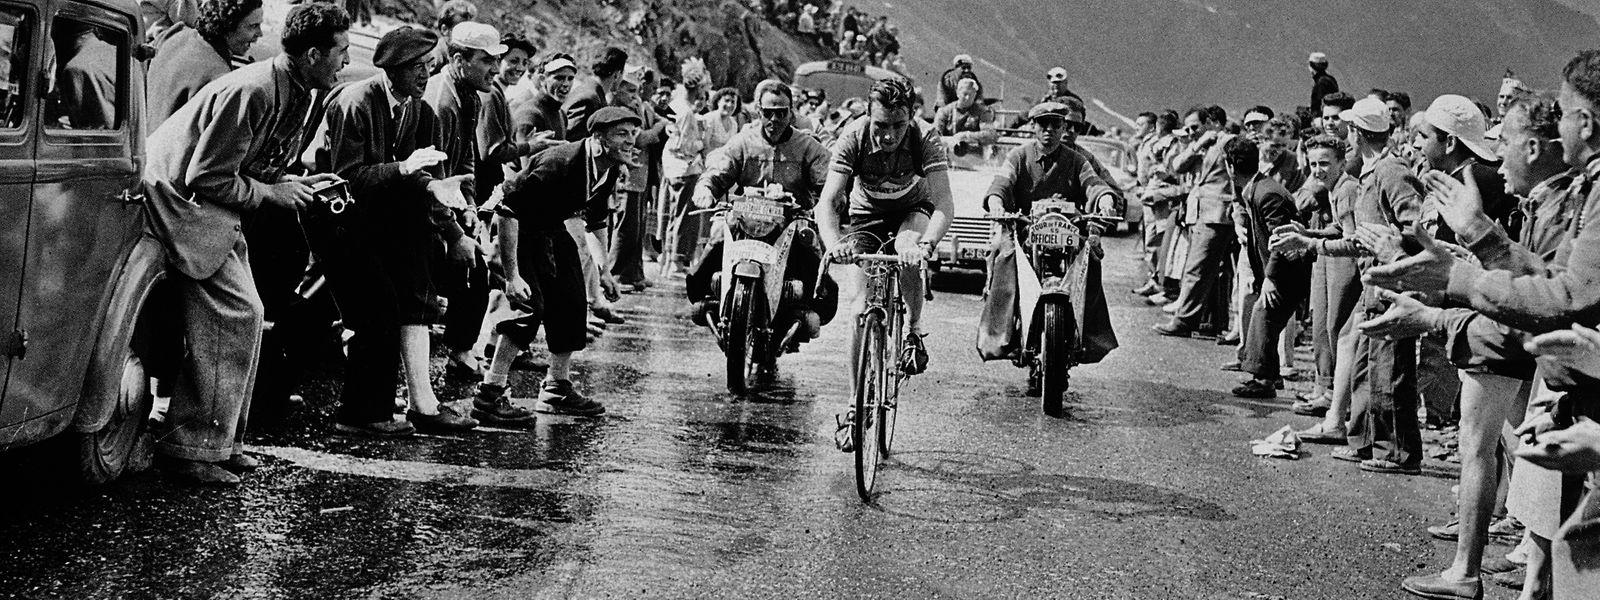 Charly Gaul holte 1958 den Sieg bei der Tour de France.